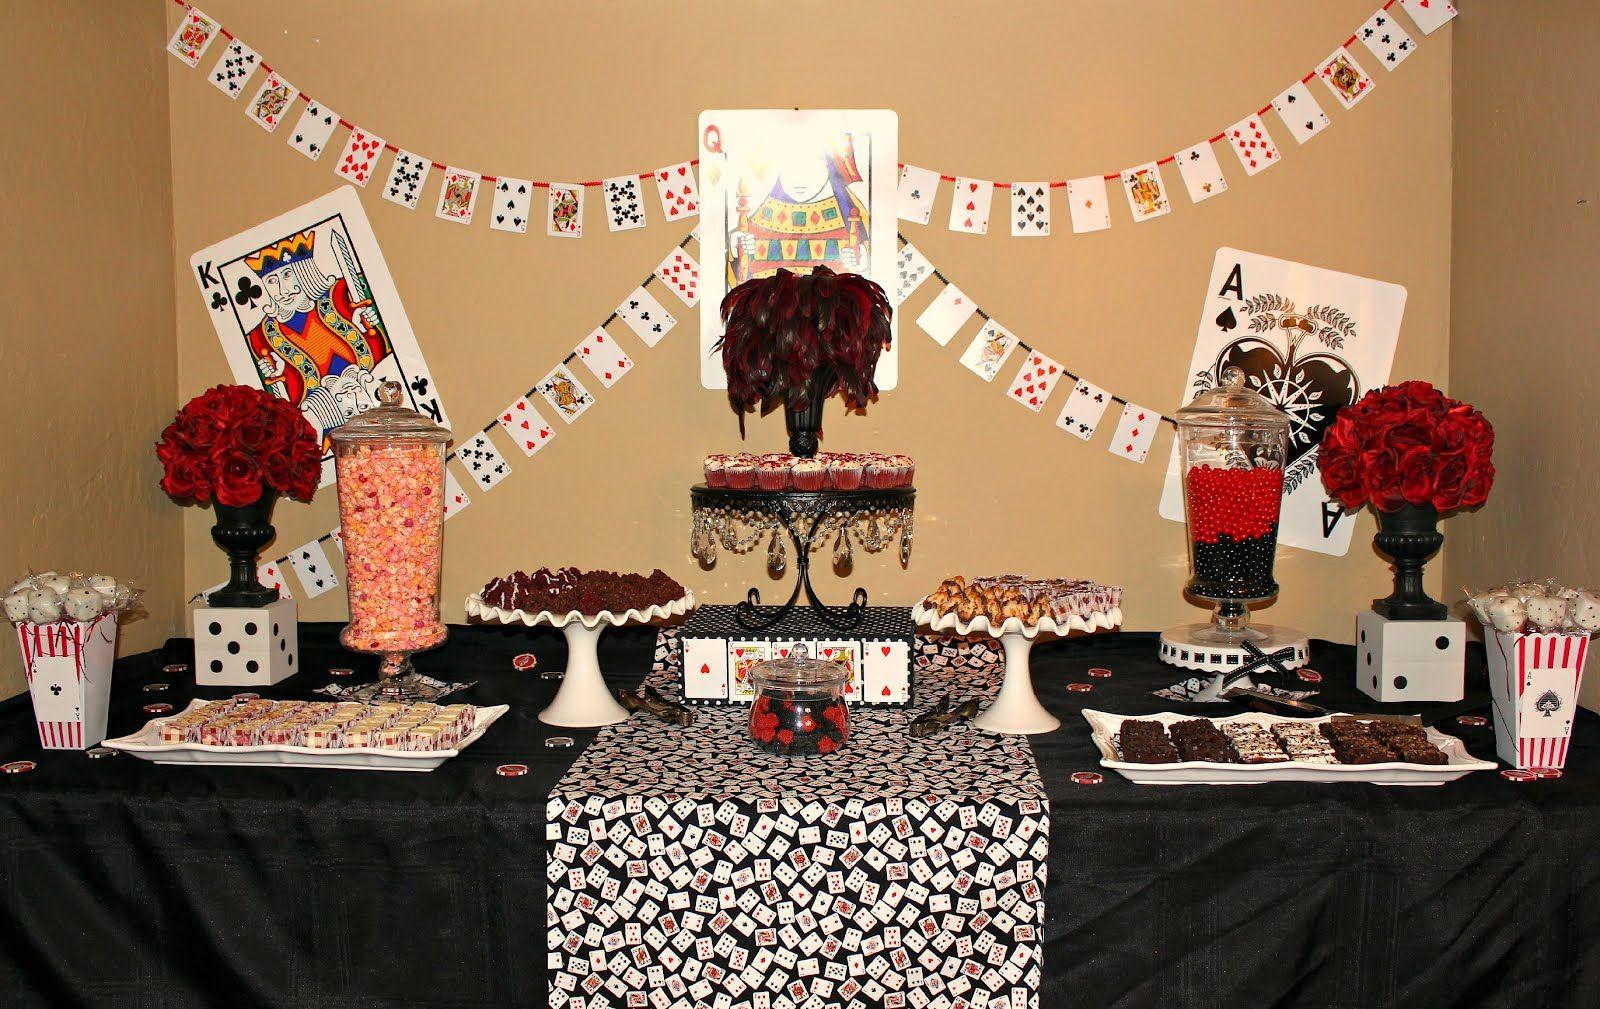 theme creative ideas party adult